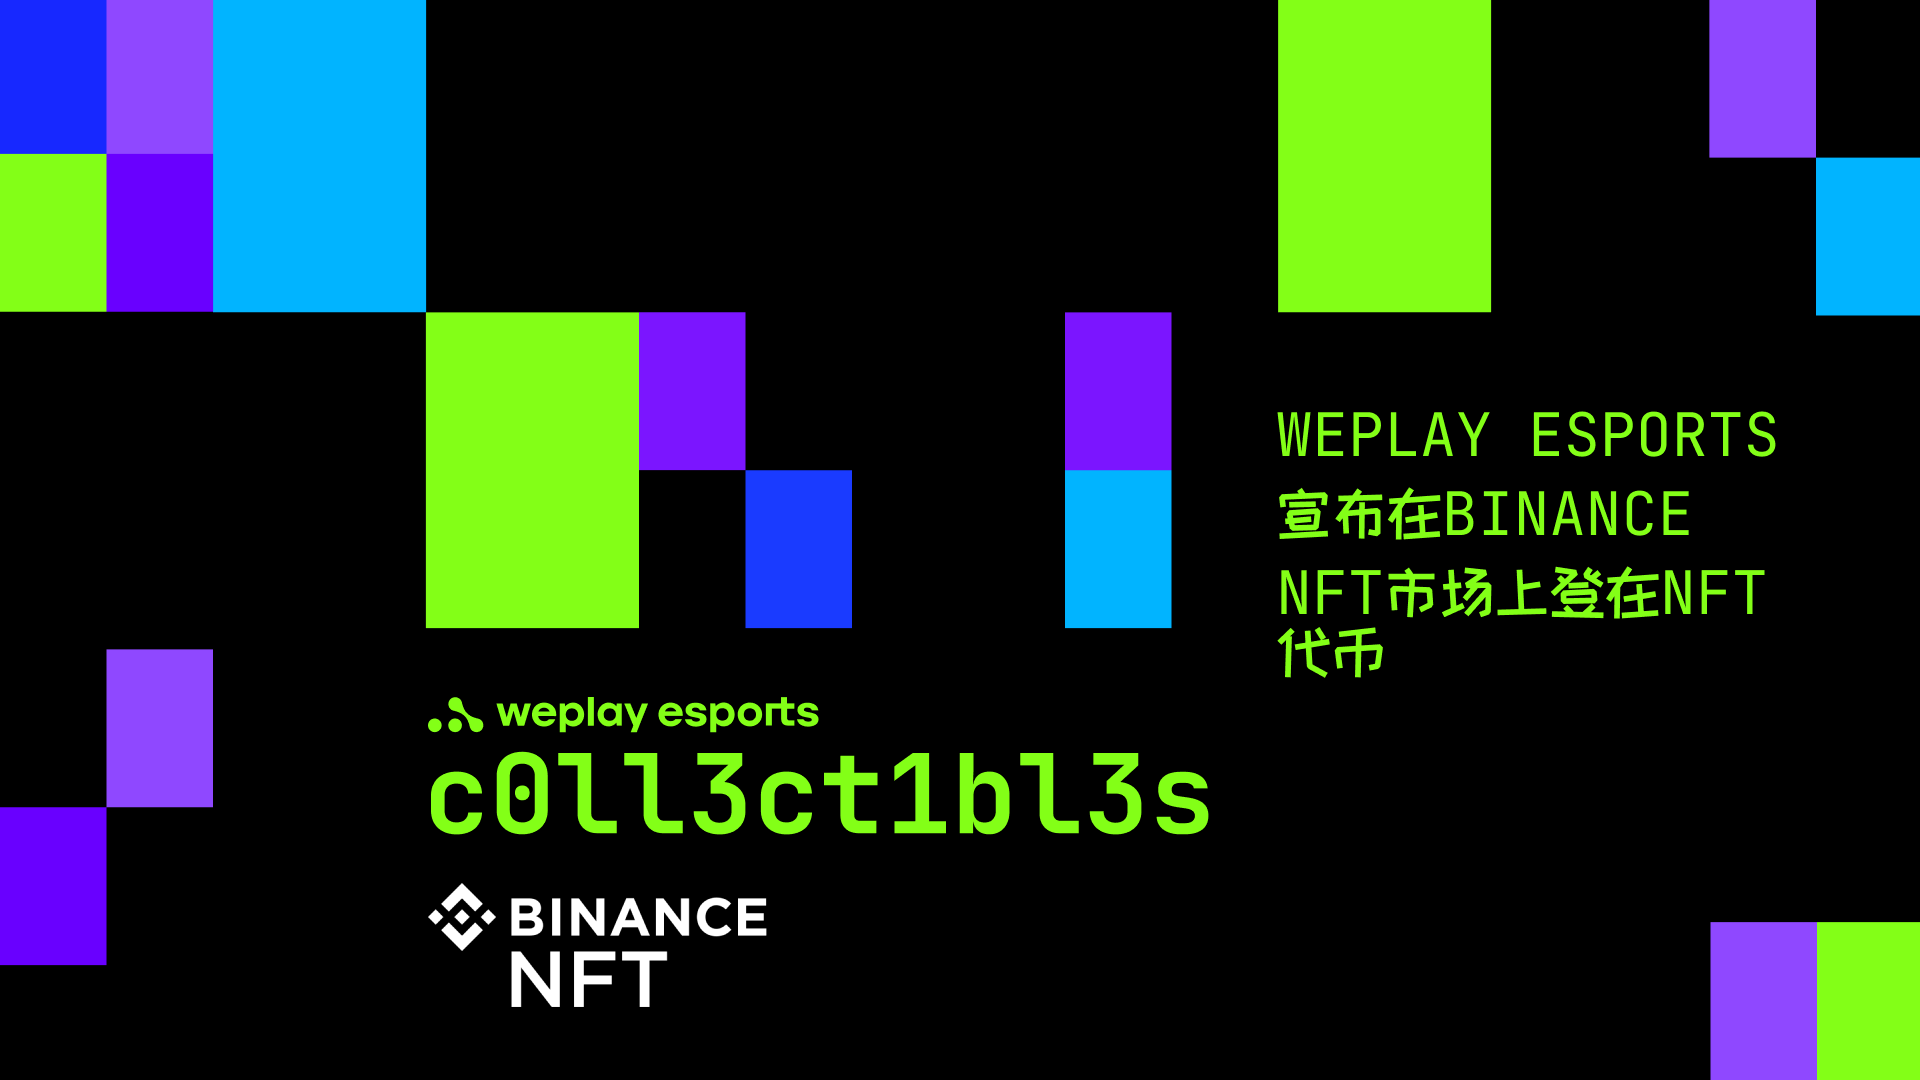 WePlay Esports宣布在Binance NFT市场上登在NFT代币。 图片:WePlay Holding